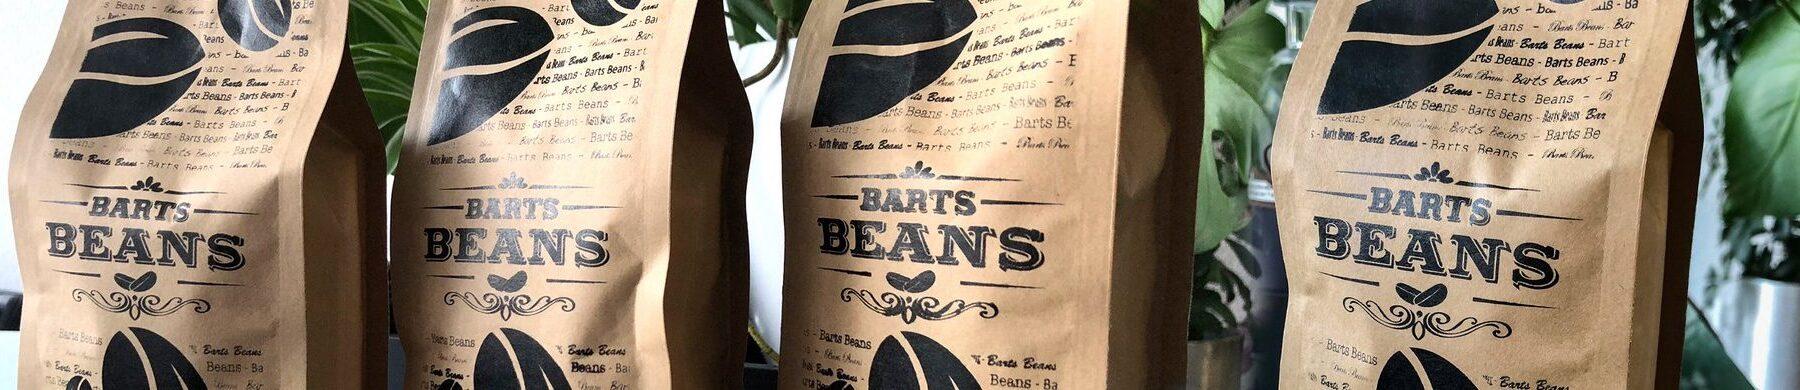 Bartsbeans Header